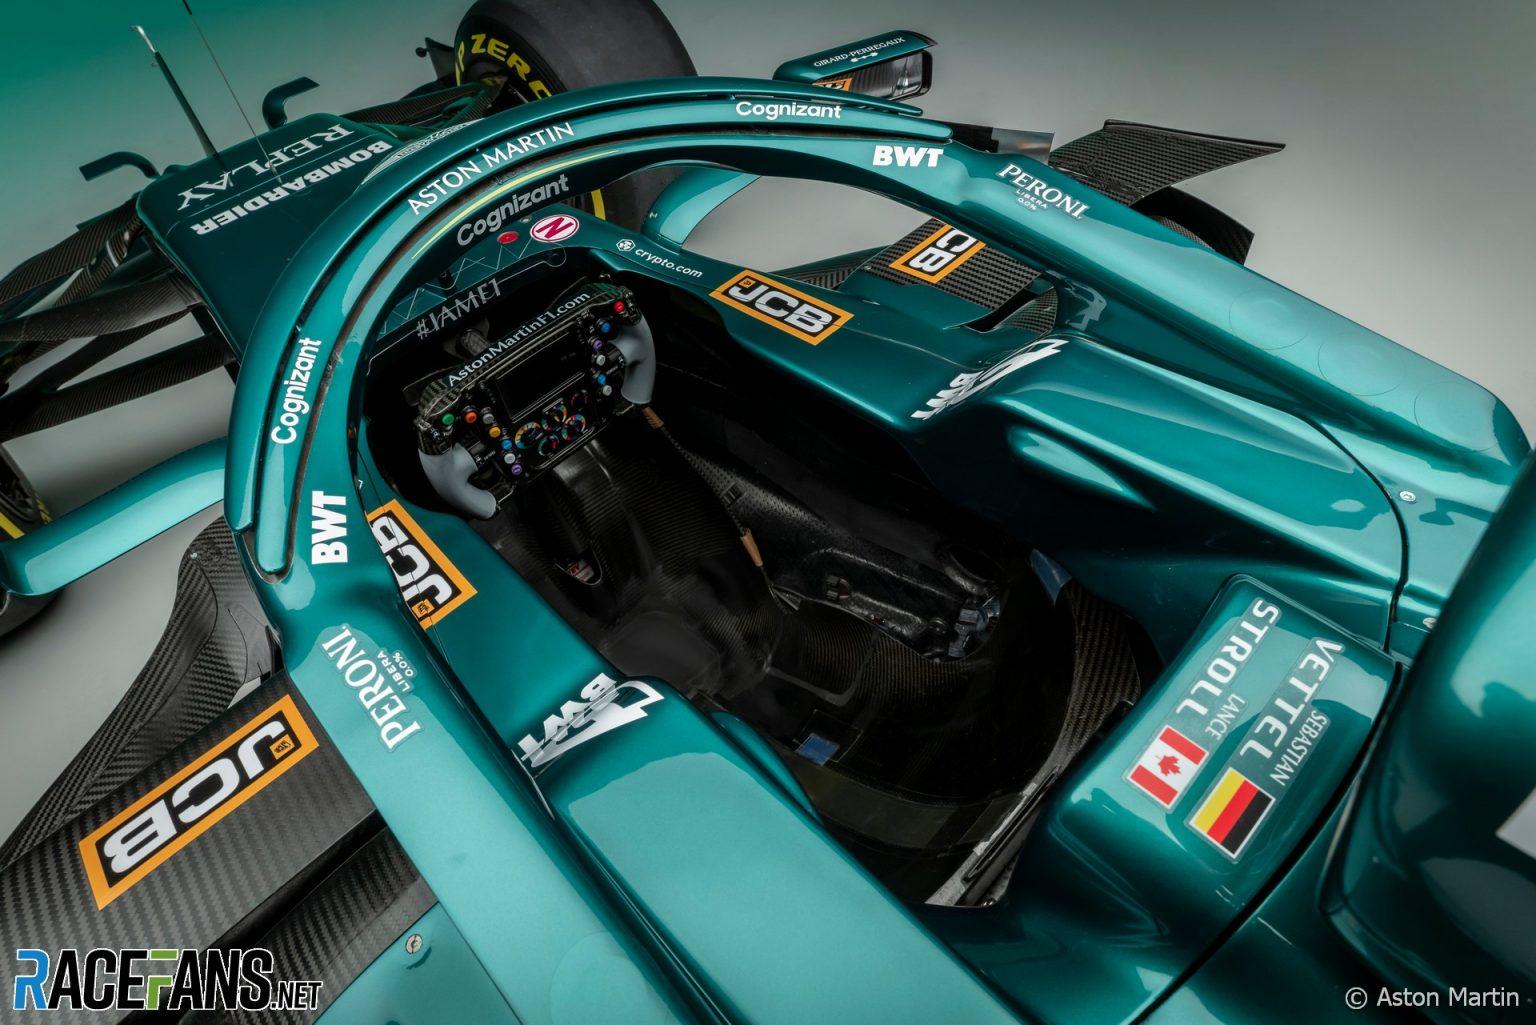 racefansdotnet-21-03-01-19-08-16-15-1536